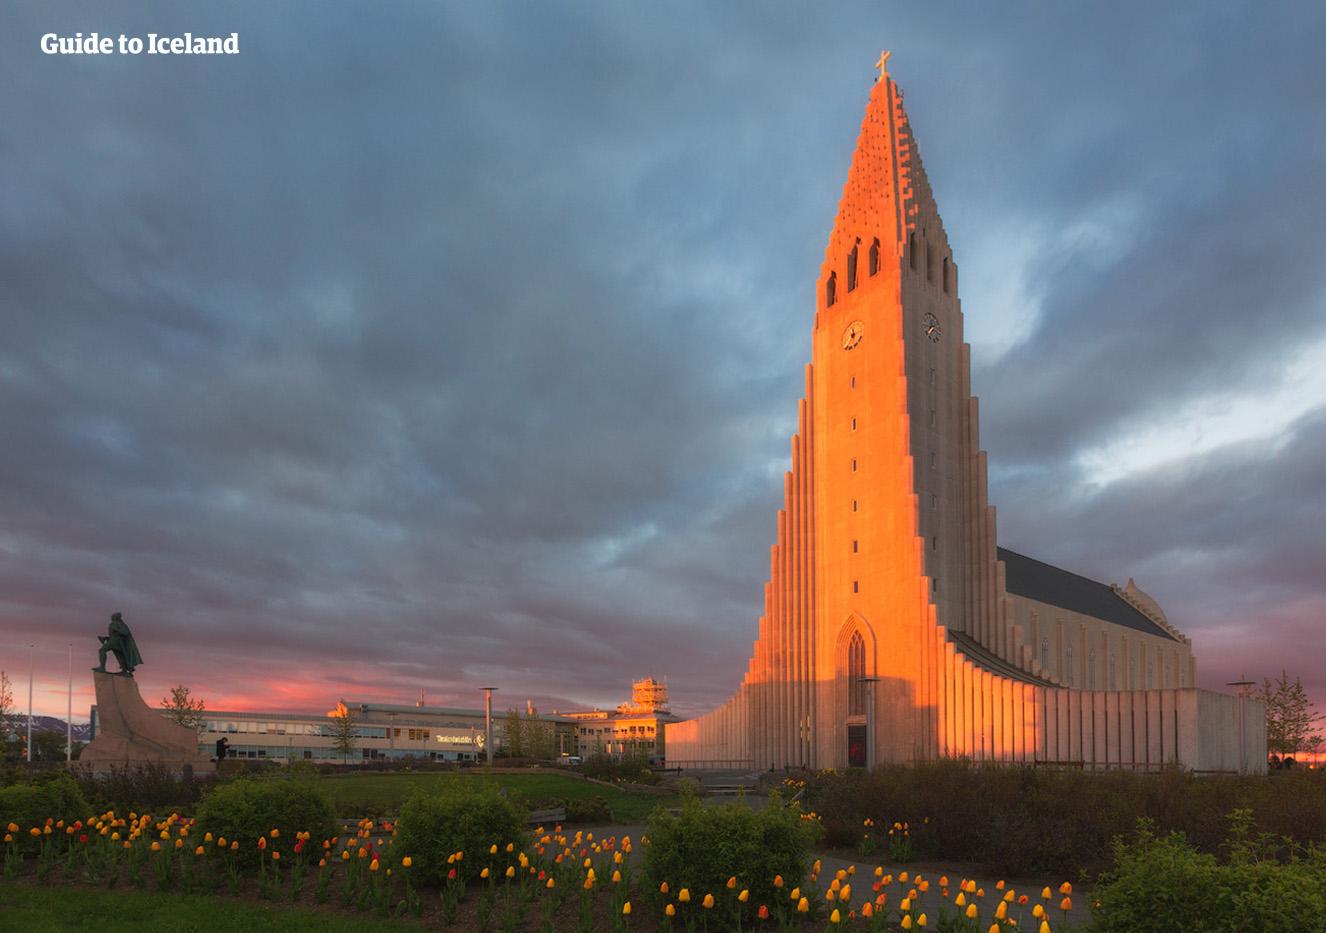 Den majestetiske kirken Hallgrímskirkja i Reykjavík i den varme gløden fra midnattssolen